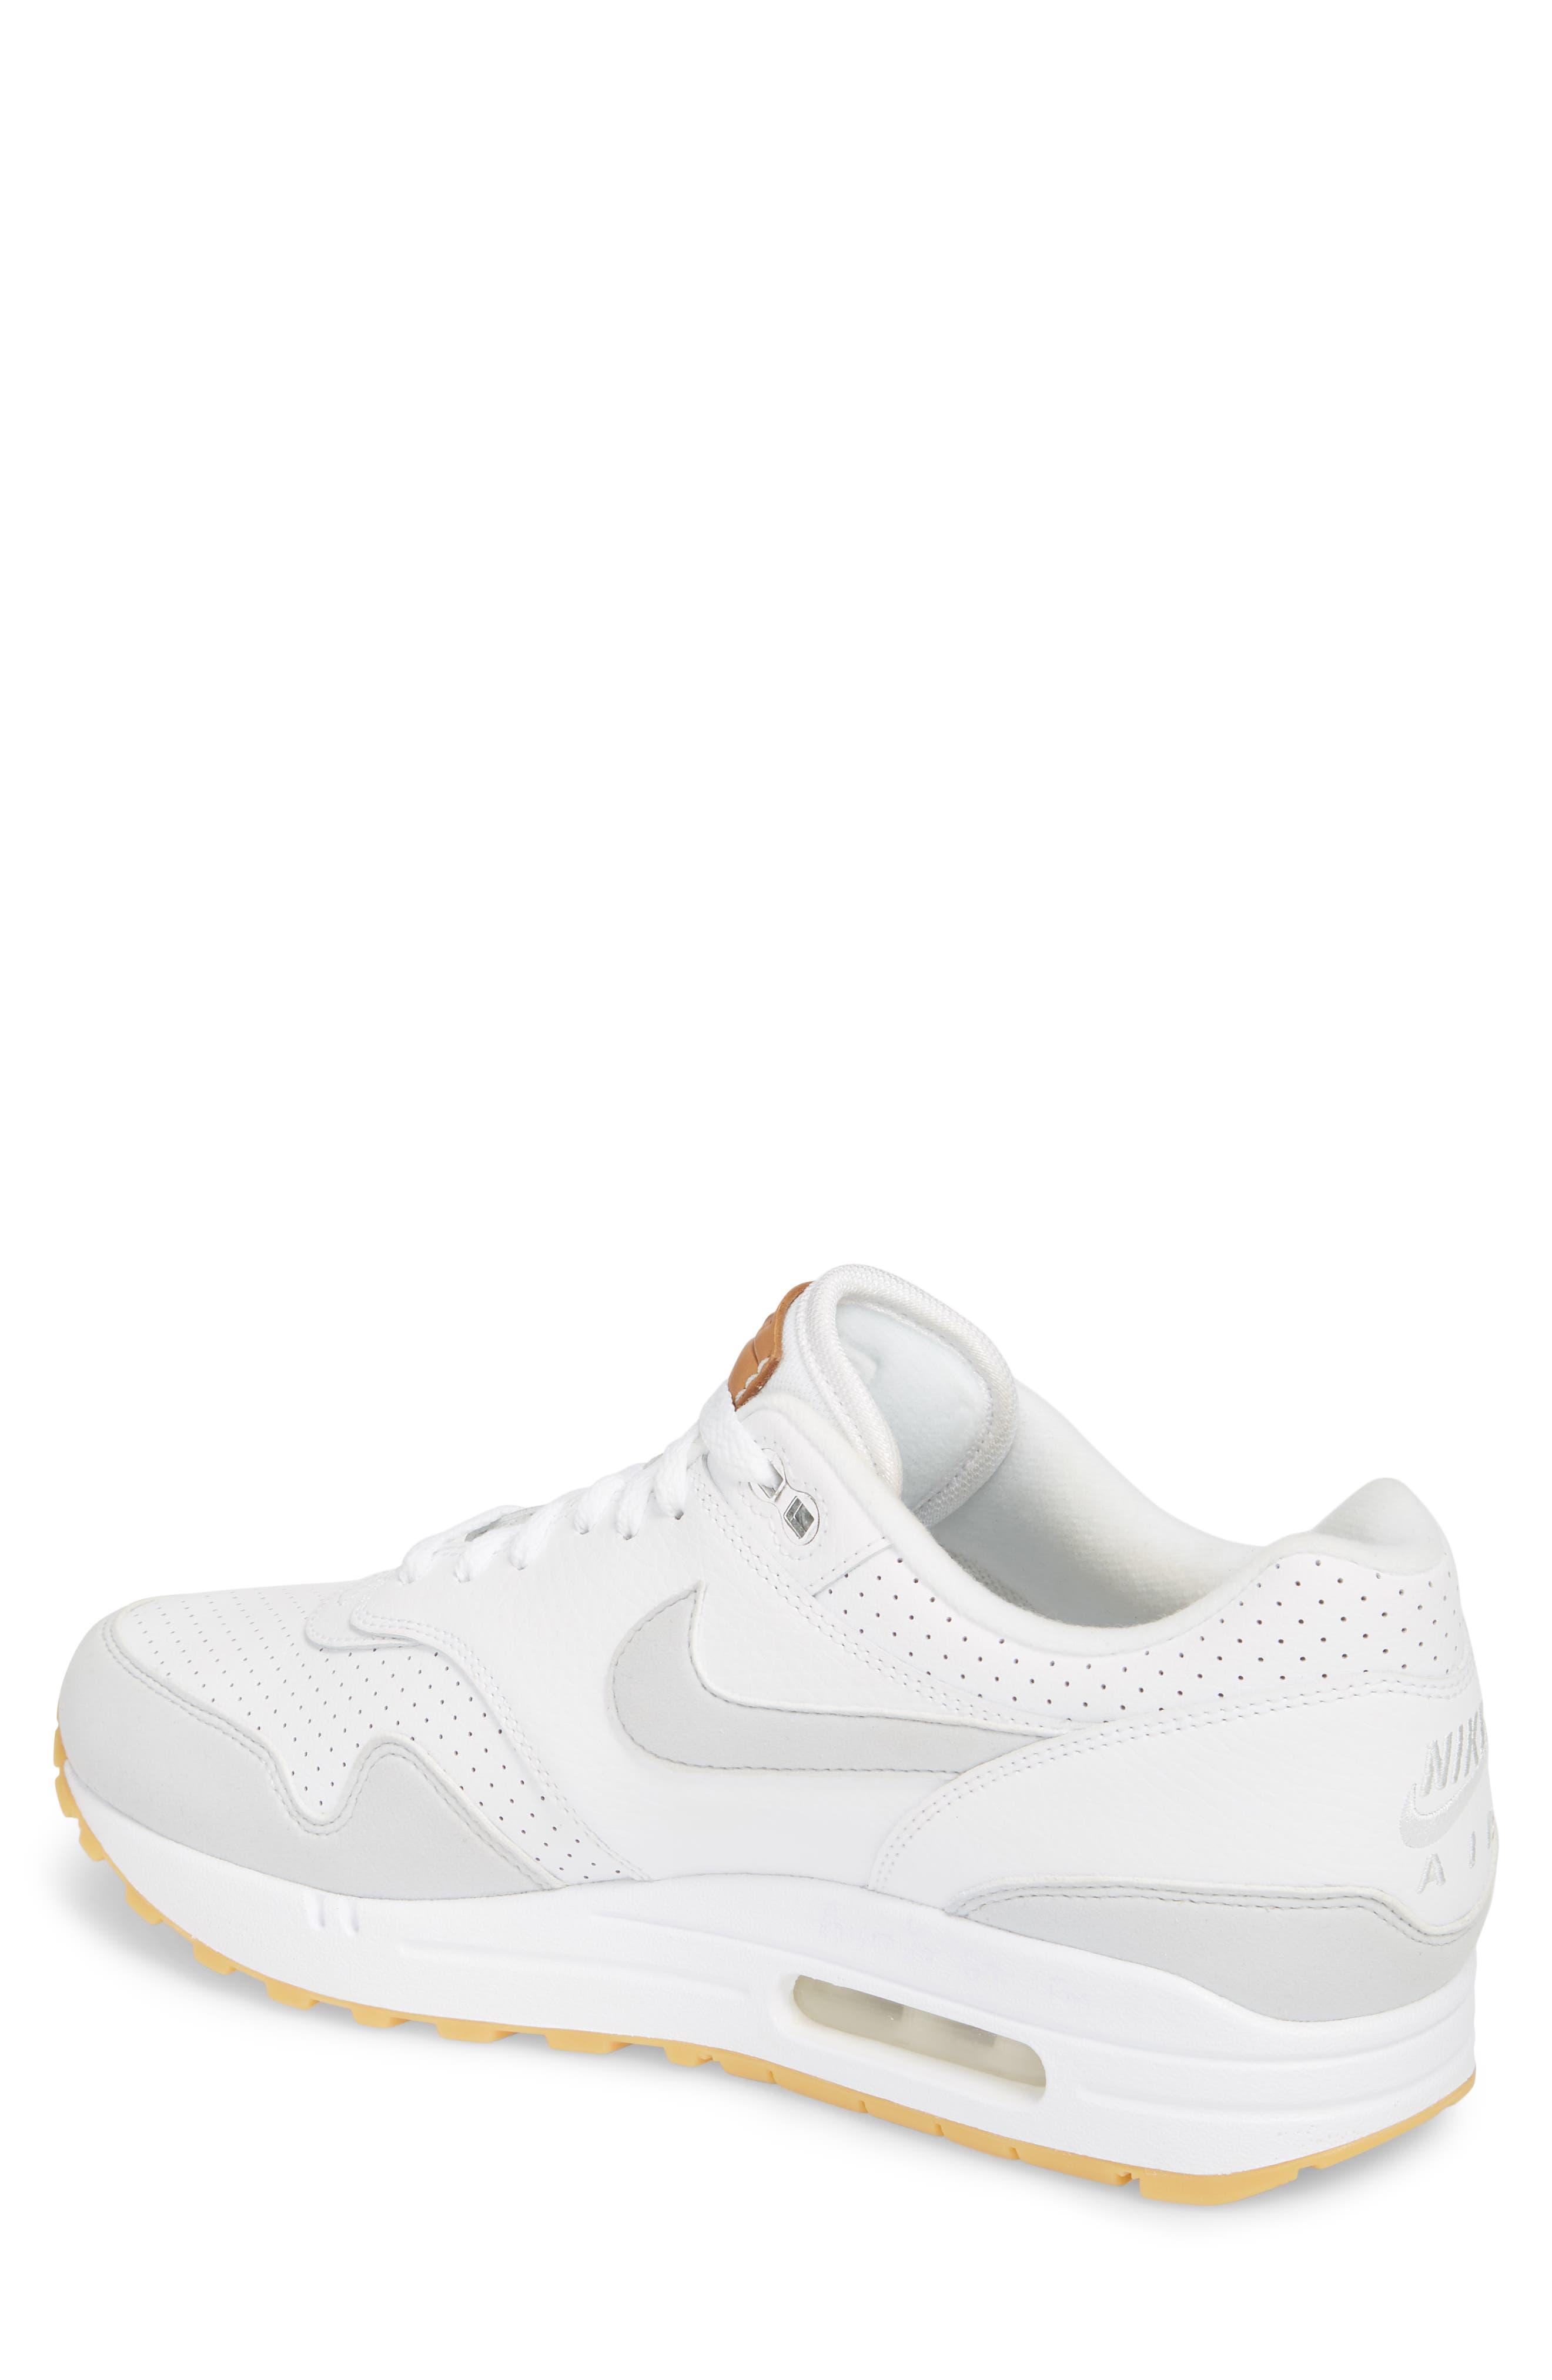 Air Max 1 Sneaker,                             Alternate thumbnail 2, color,                             White/ Pure Platinum/ Yellow